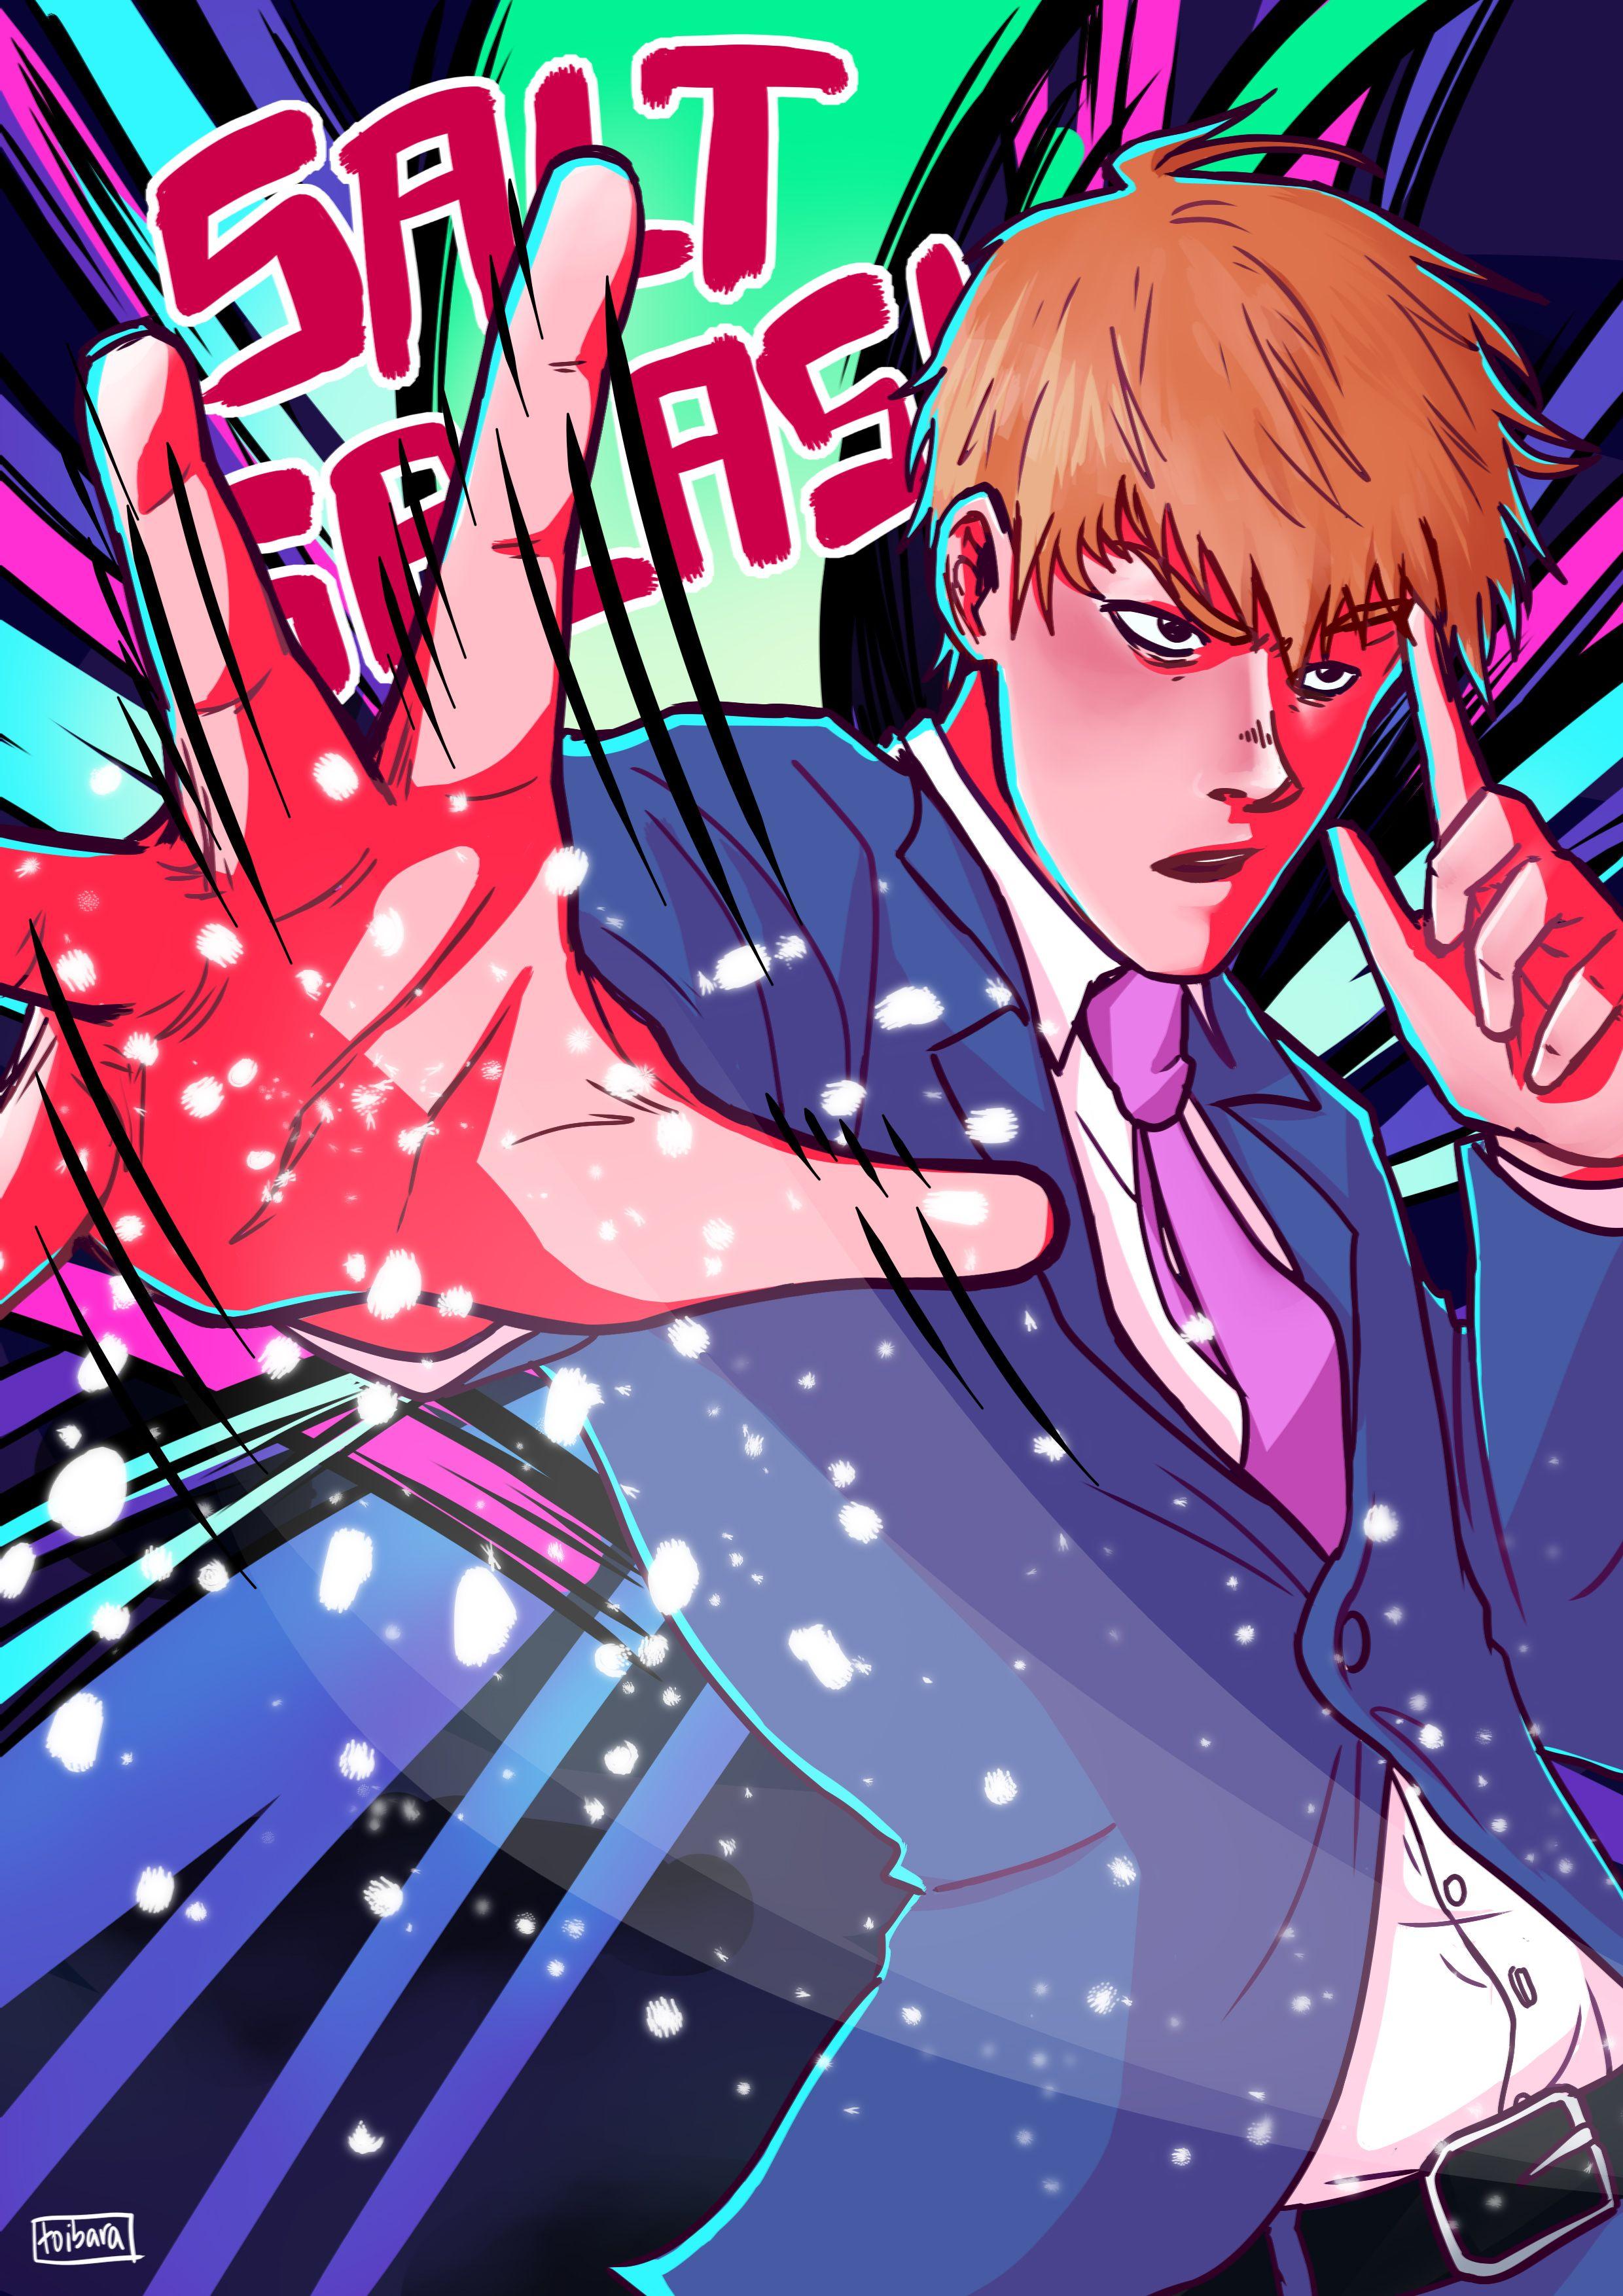 Arataka Reigen Mob Psycho Anime Psycho 100